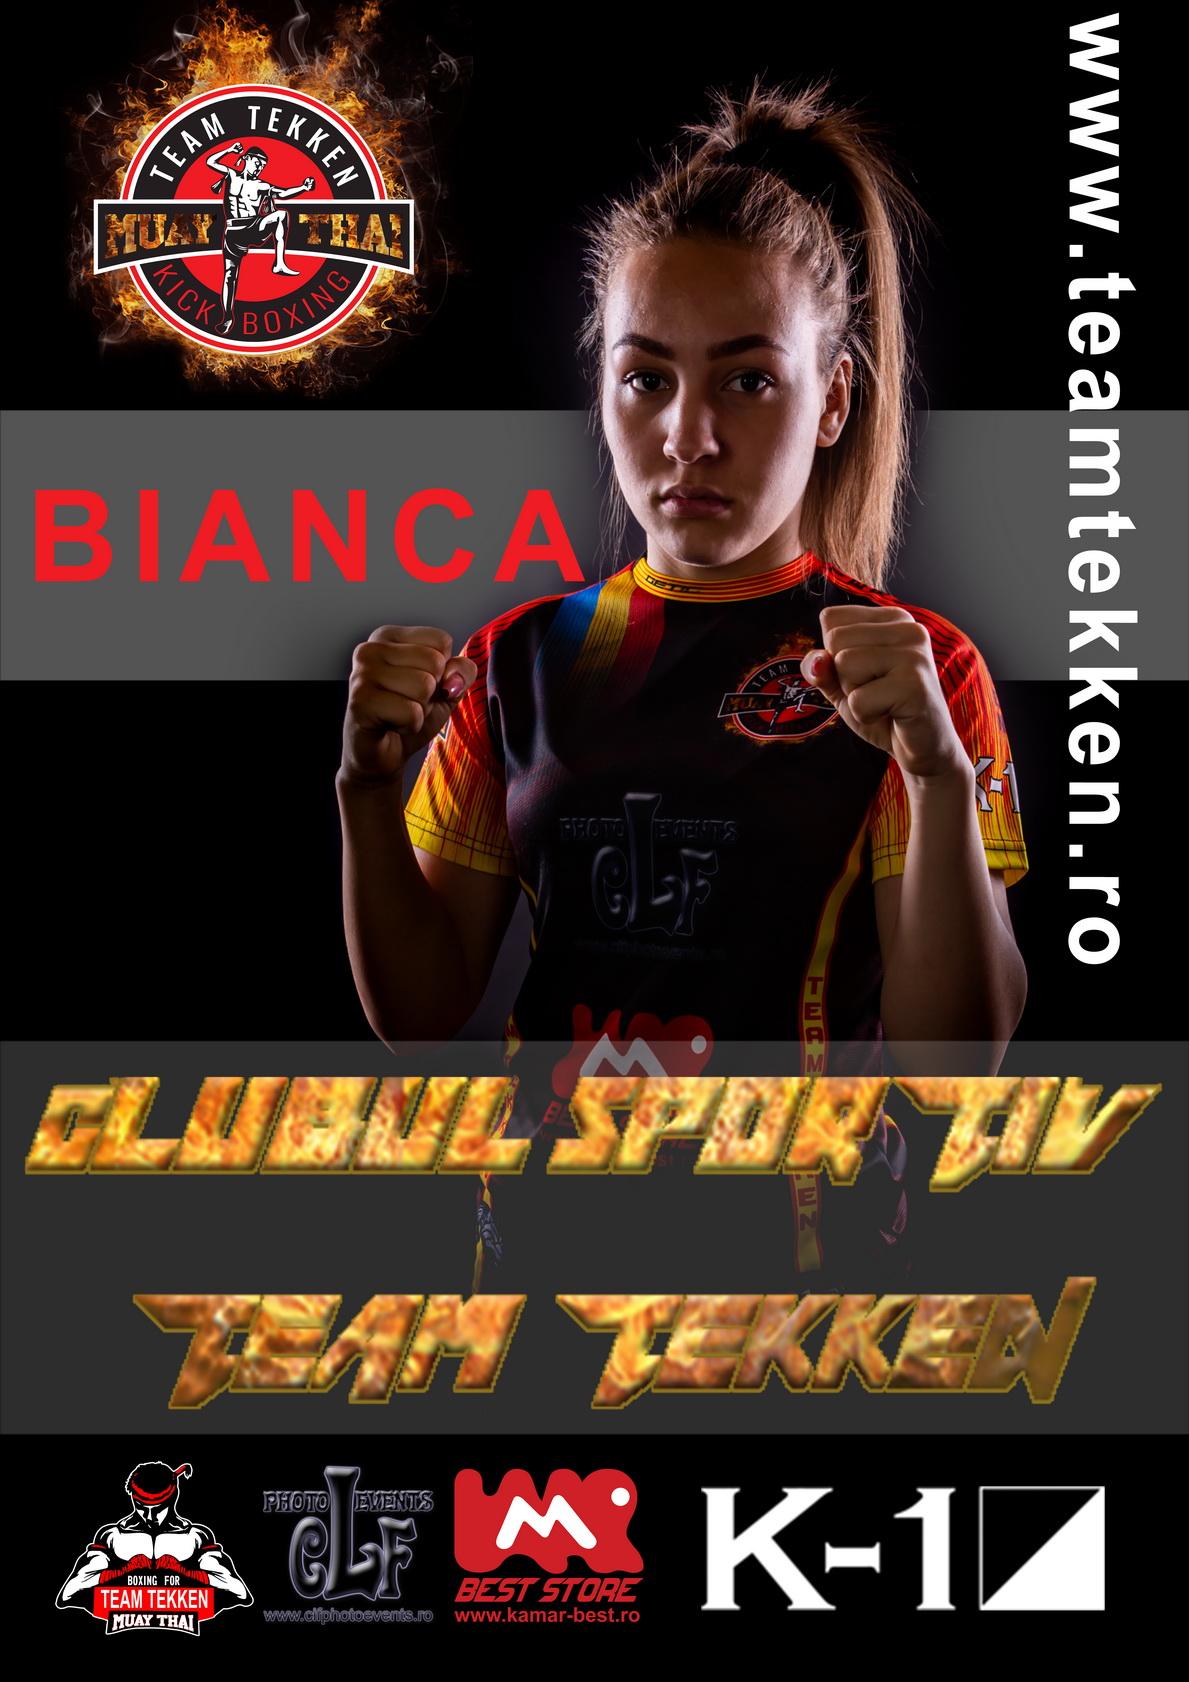 portofoilu 2 CLUB POSTER 1 Bianca